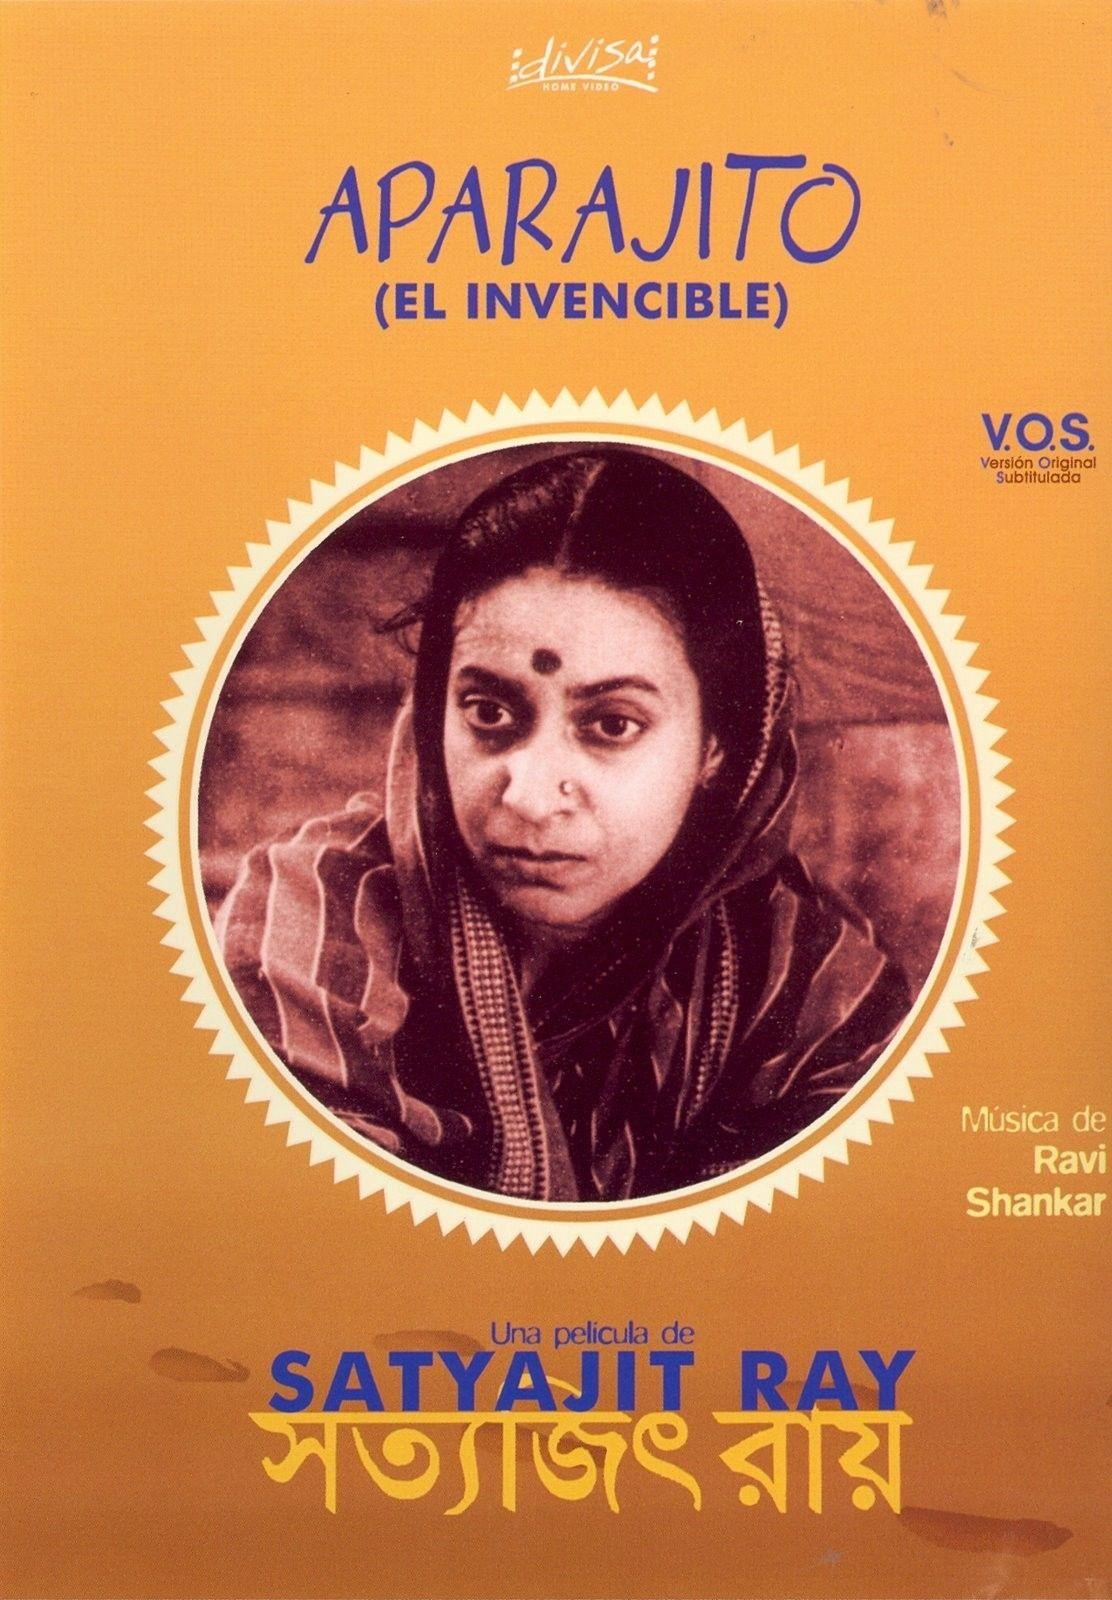 Download Film Aparajito 1956